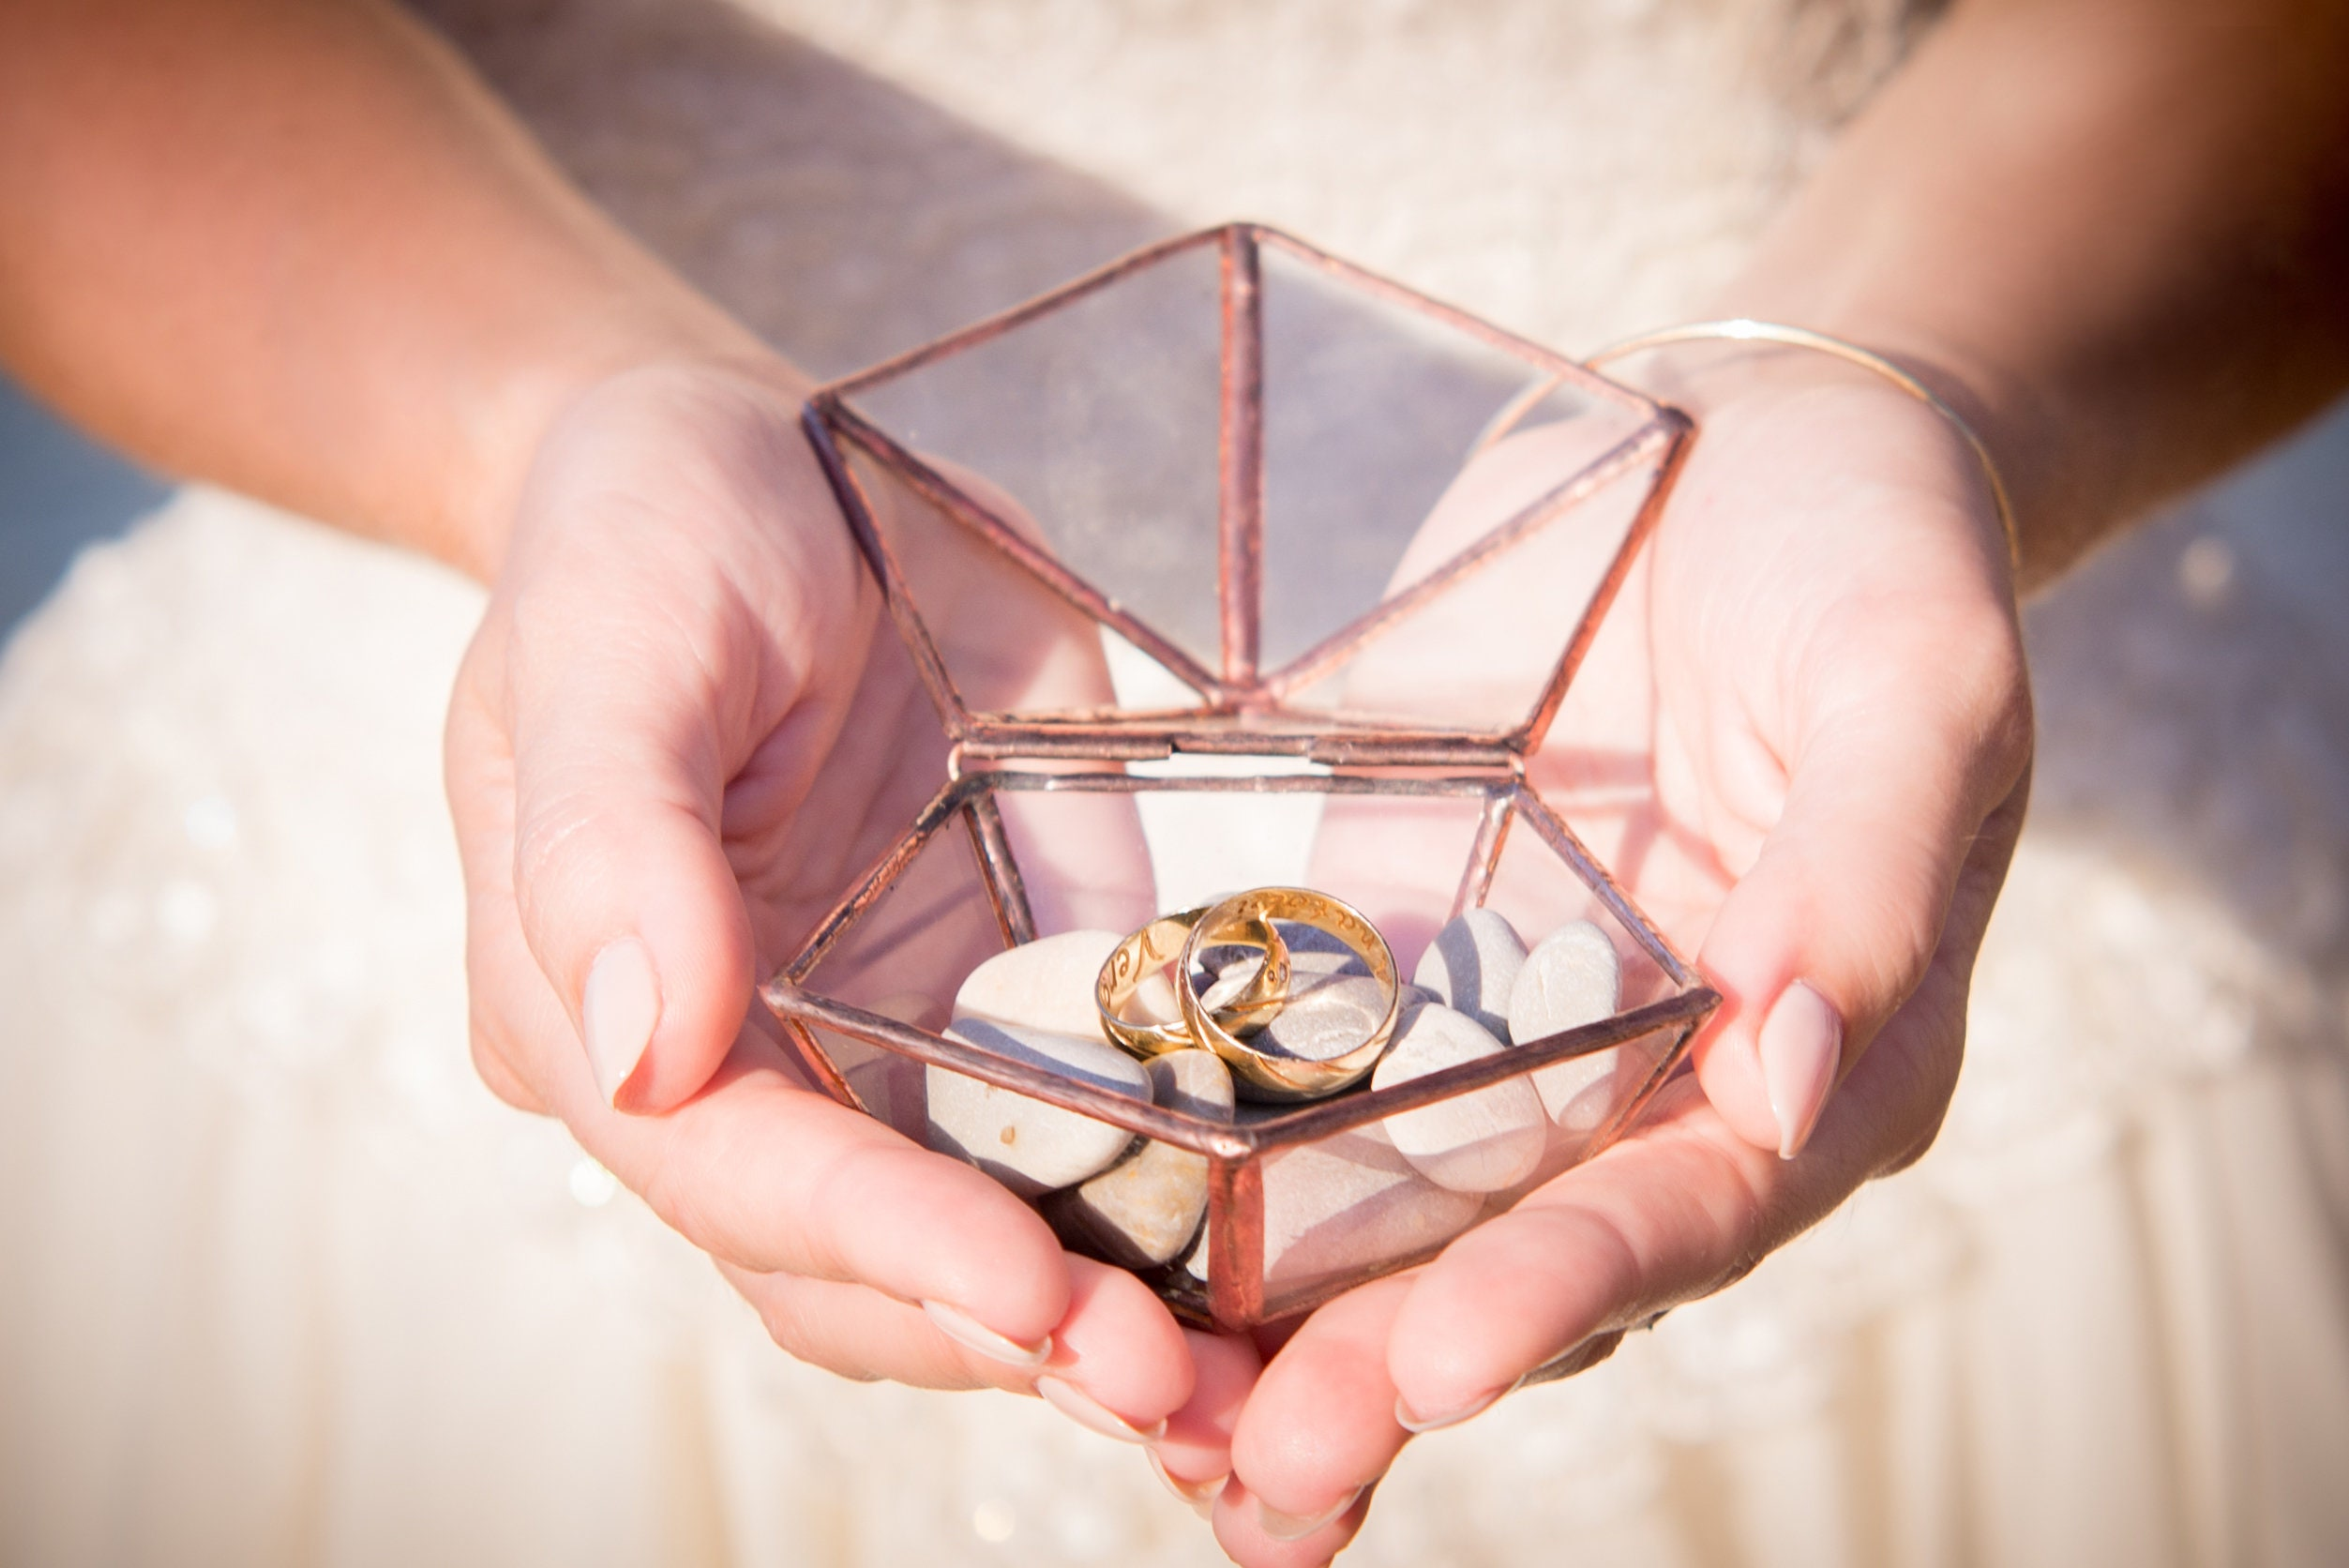 Personalized glass ring box Hawaii wedding Beach ceremony | Etsy